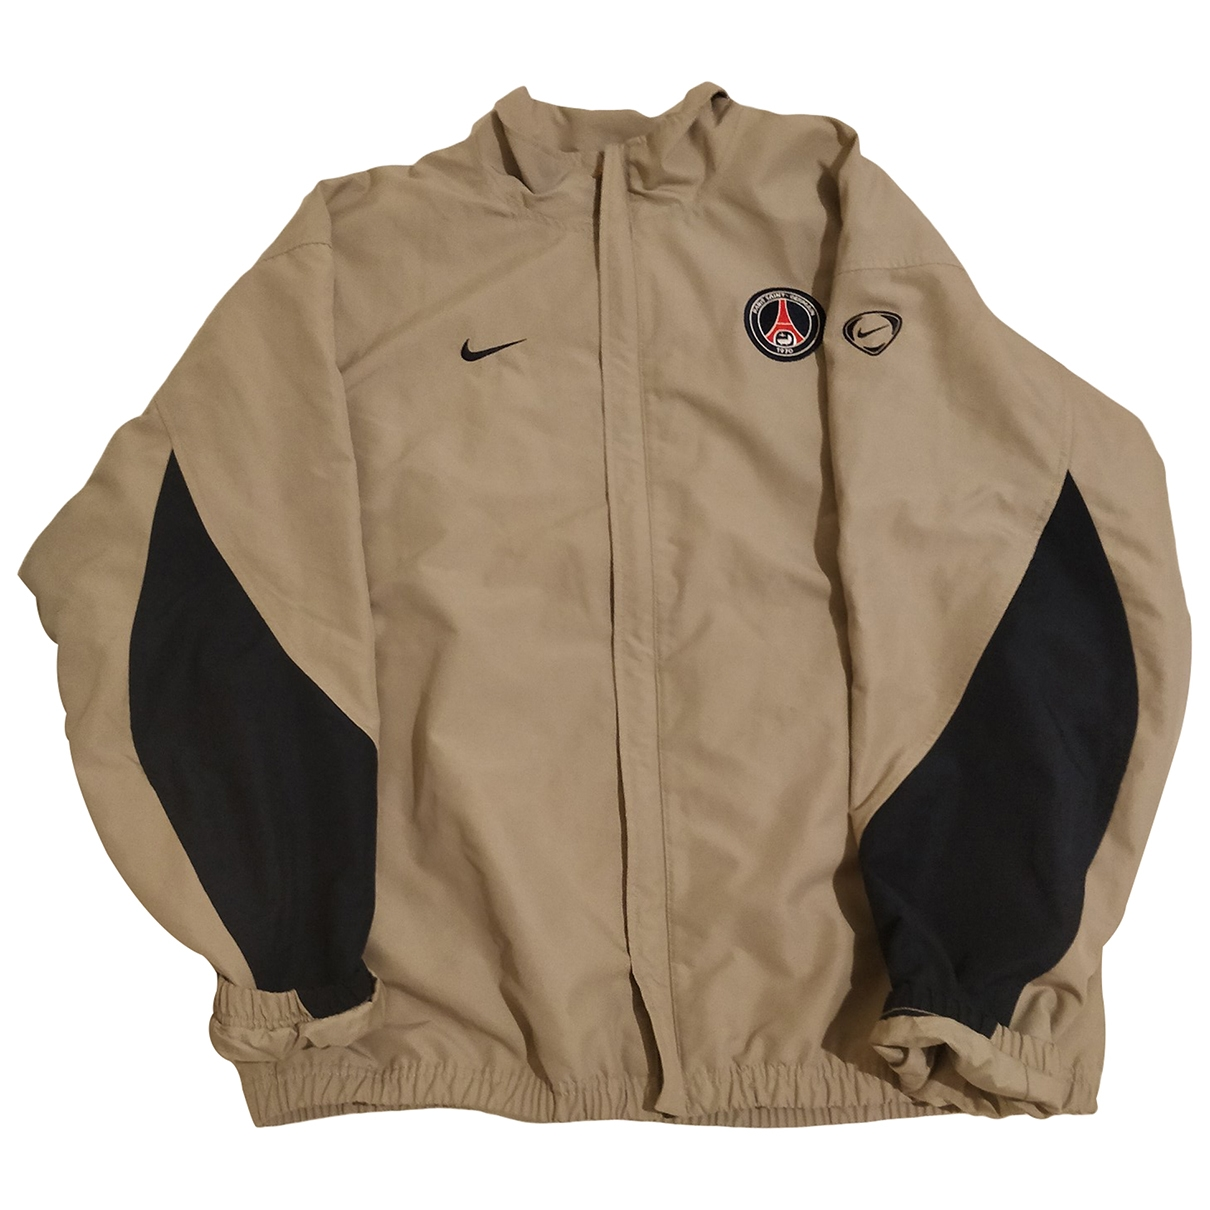 Nike \N Beige jacket  for Men XL International